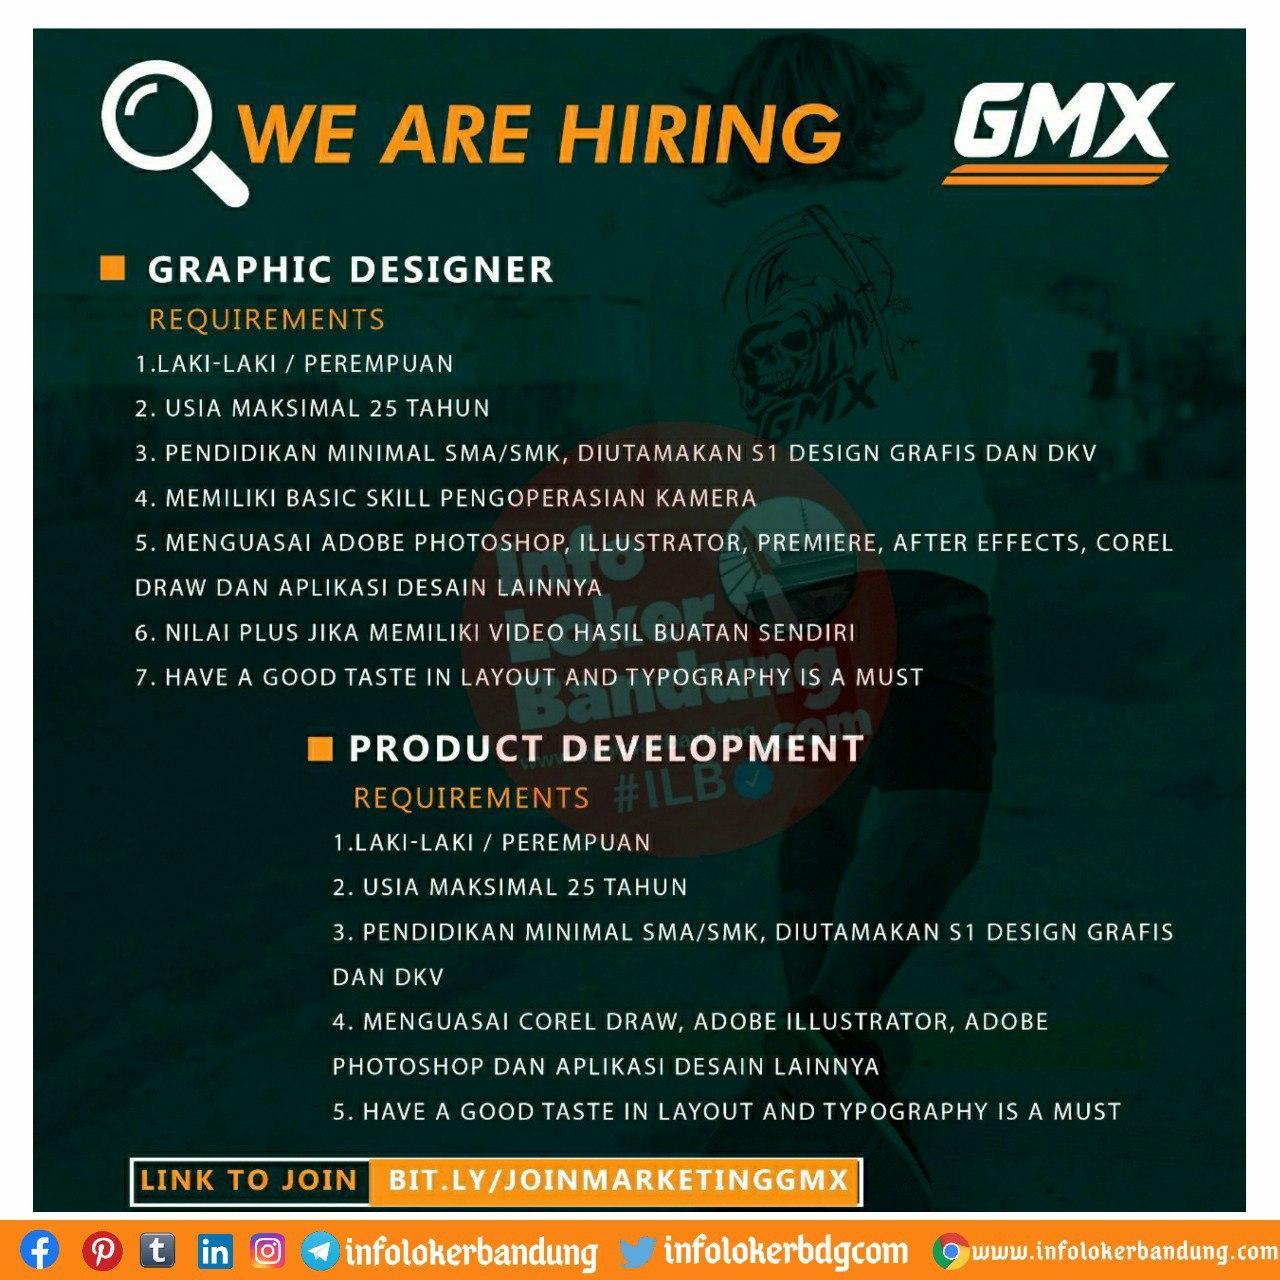 Lowongan Kerja GMX Bandung September 2020